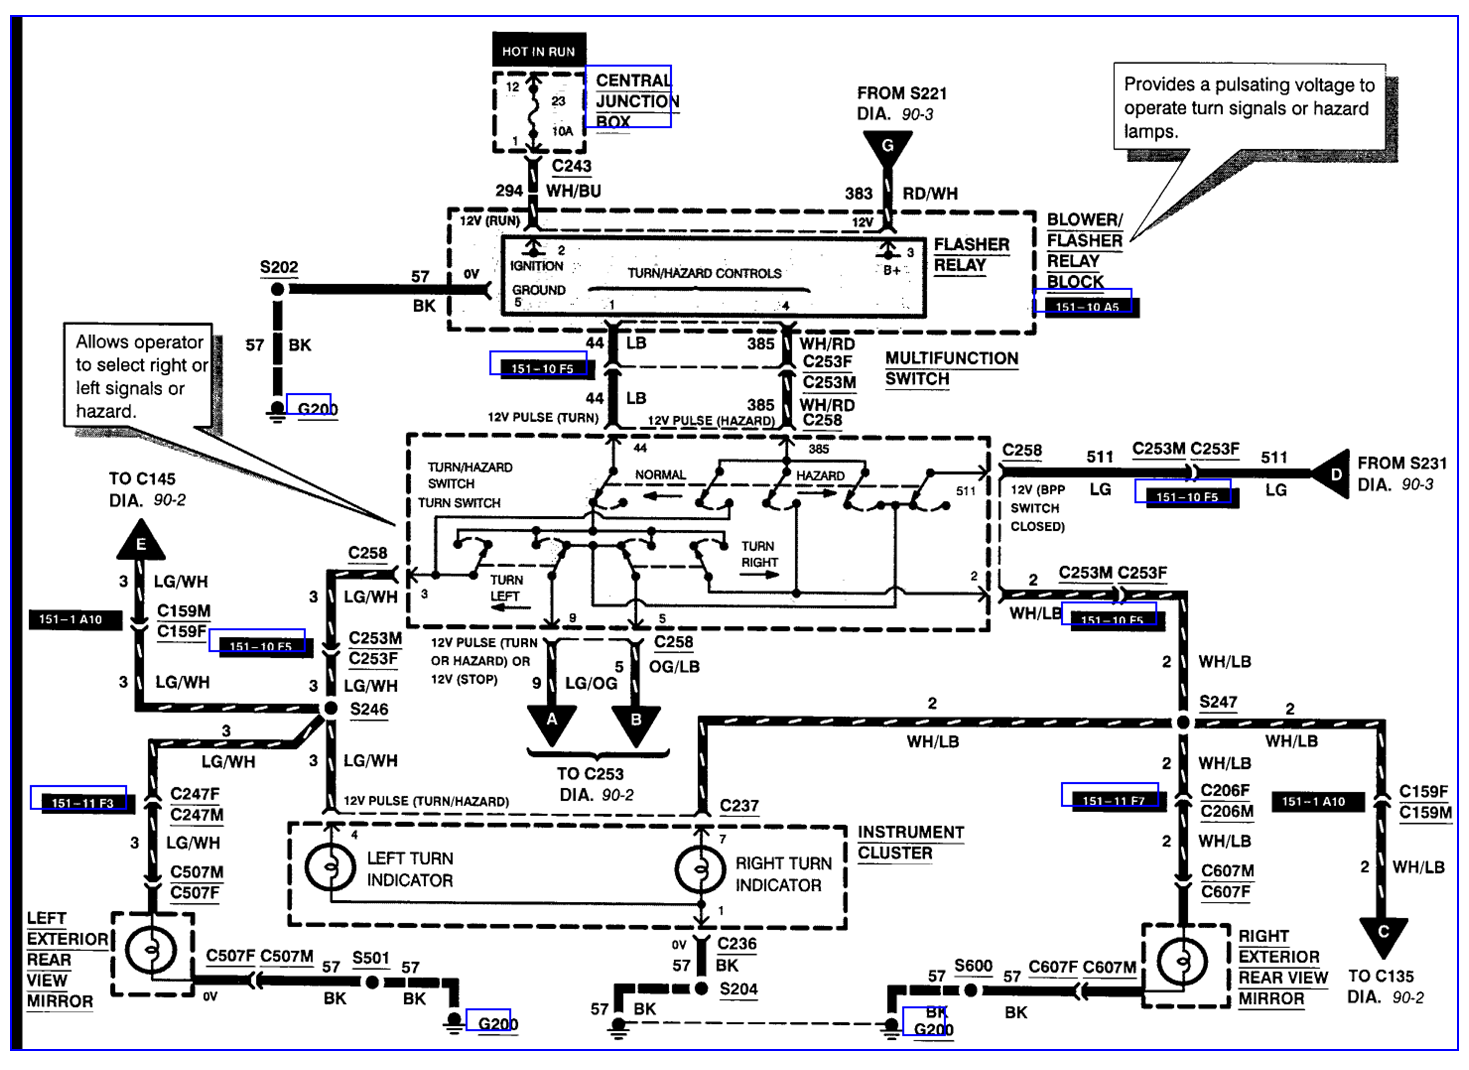 99 Ford F 350 Ignition Switch Wire Diagram 66 Gto Radio Wiring Diagram Begeboy Wiring Diagram Source